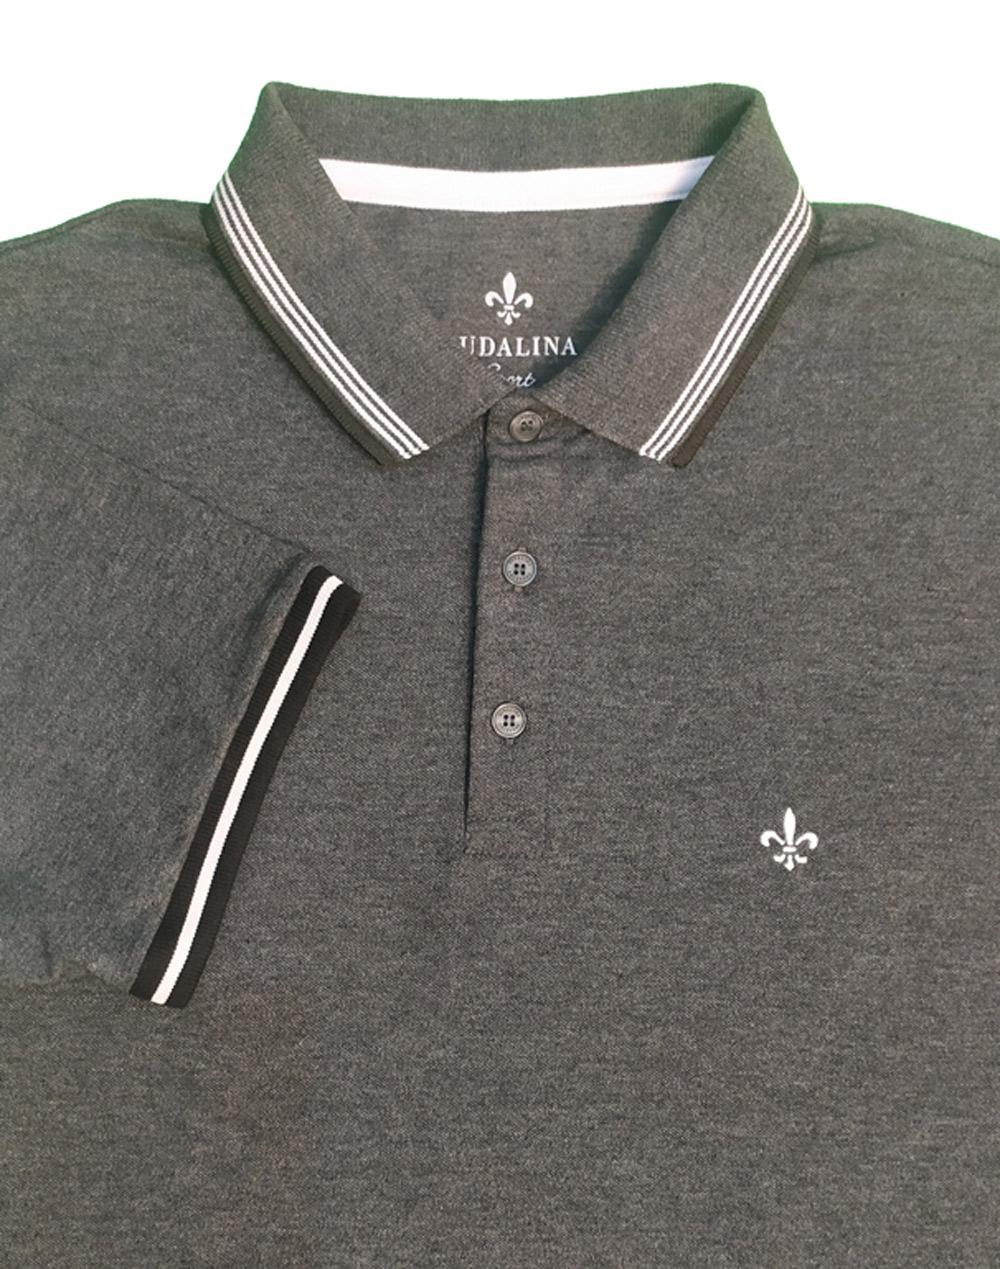 Camisa Masculina Gola Polo Sport Friso Dudalina